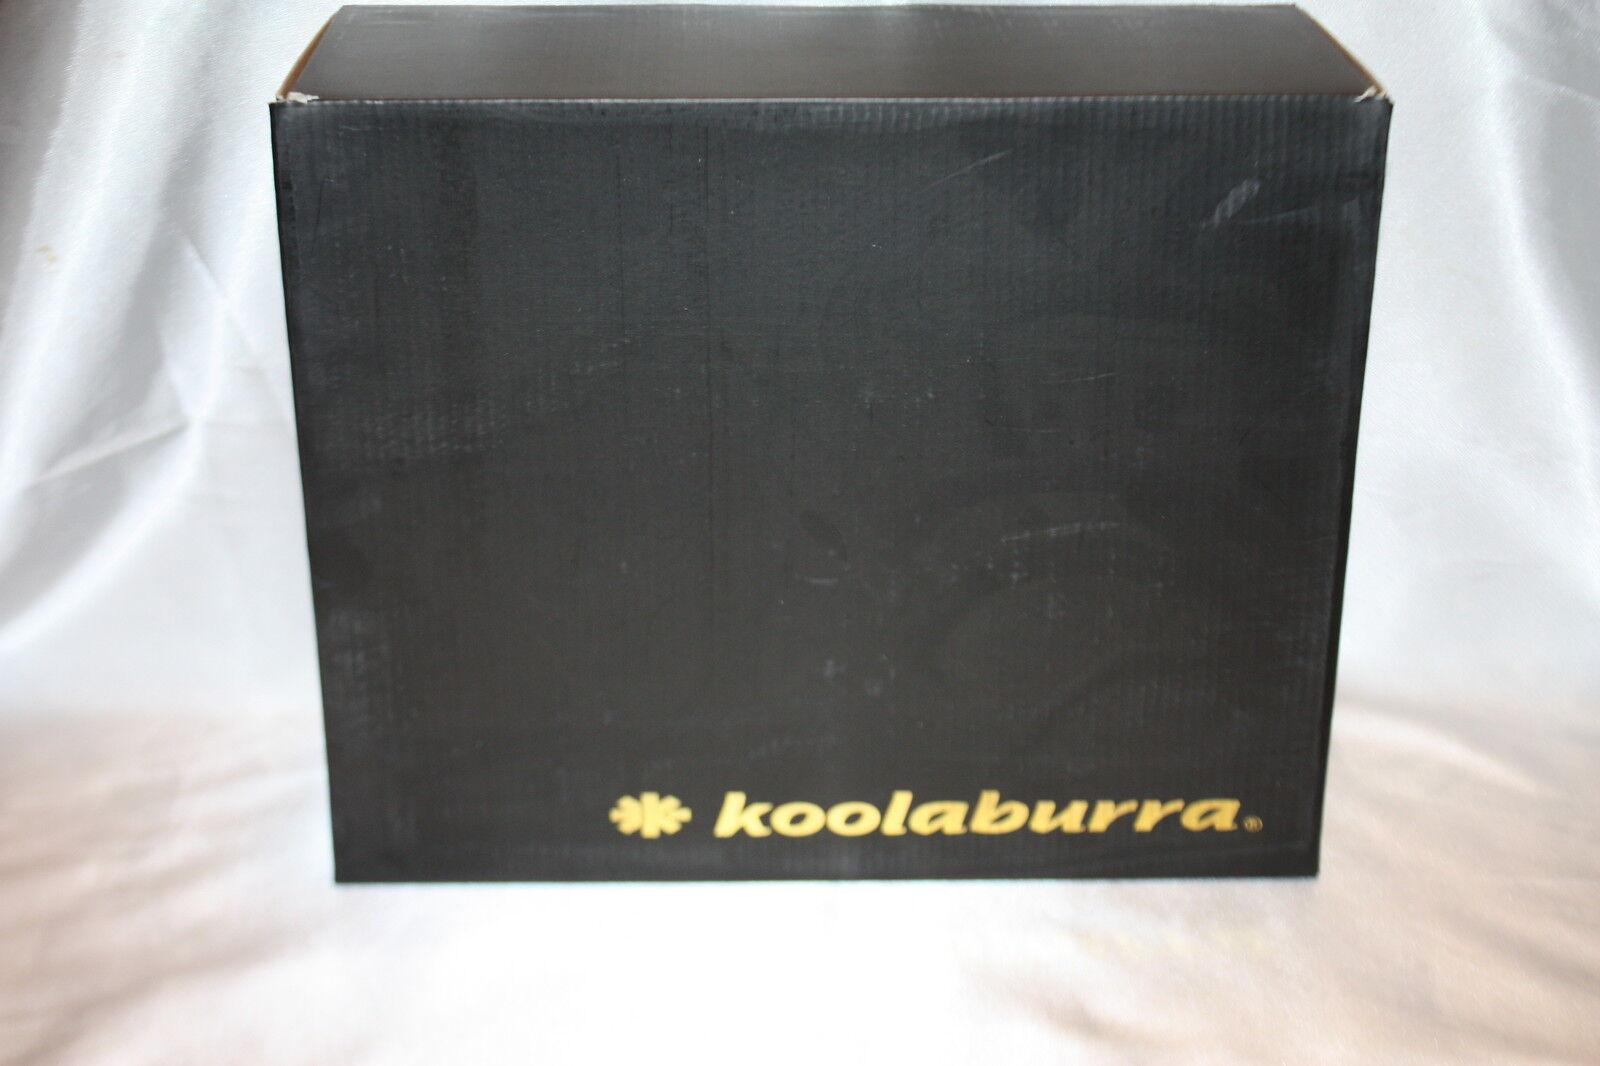 NEW Clogs  KOOLABURRA Chestnut Suede Sheepskin Shearling KHLOE Clogs NEW Mules 11 198 087761